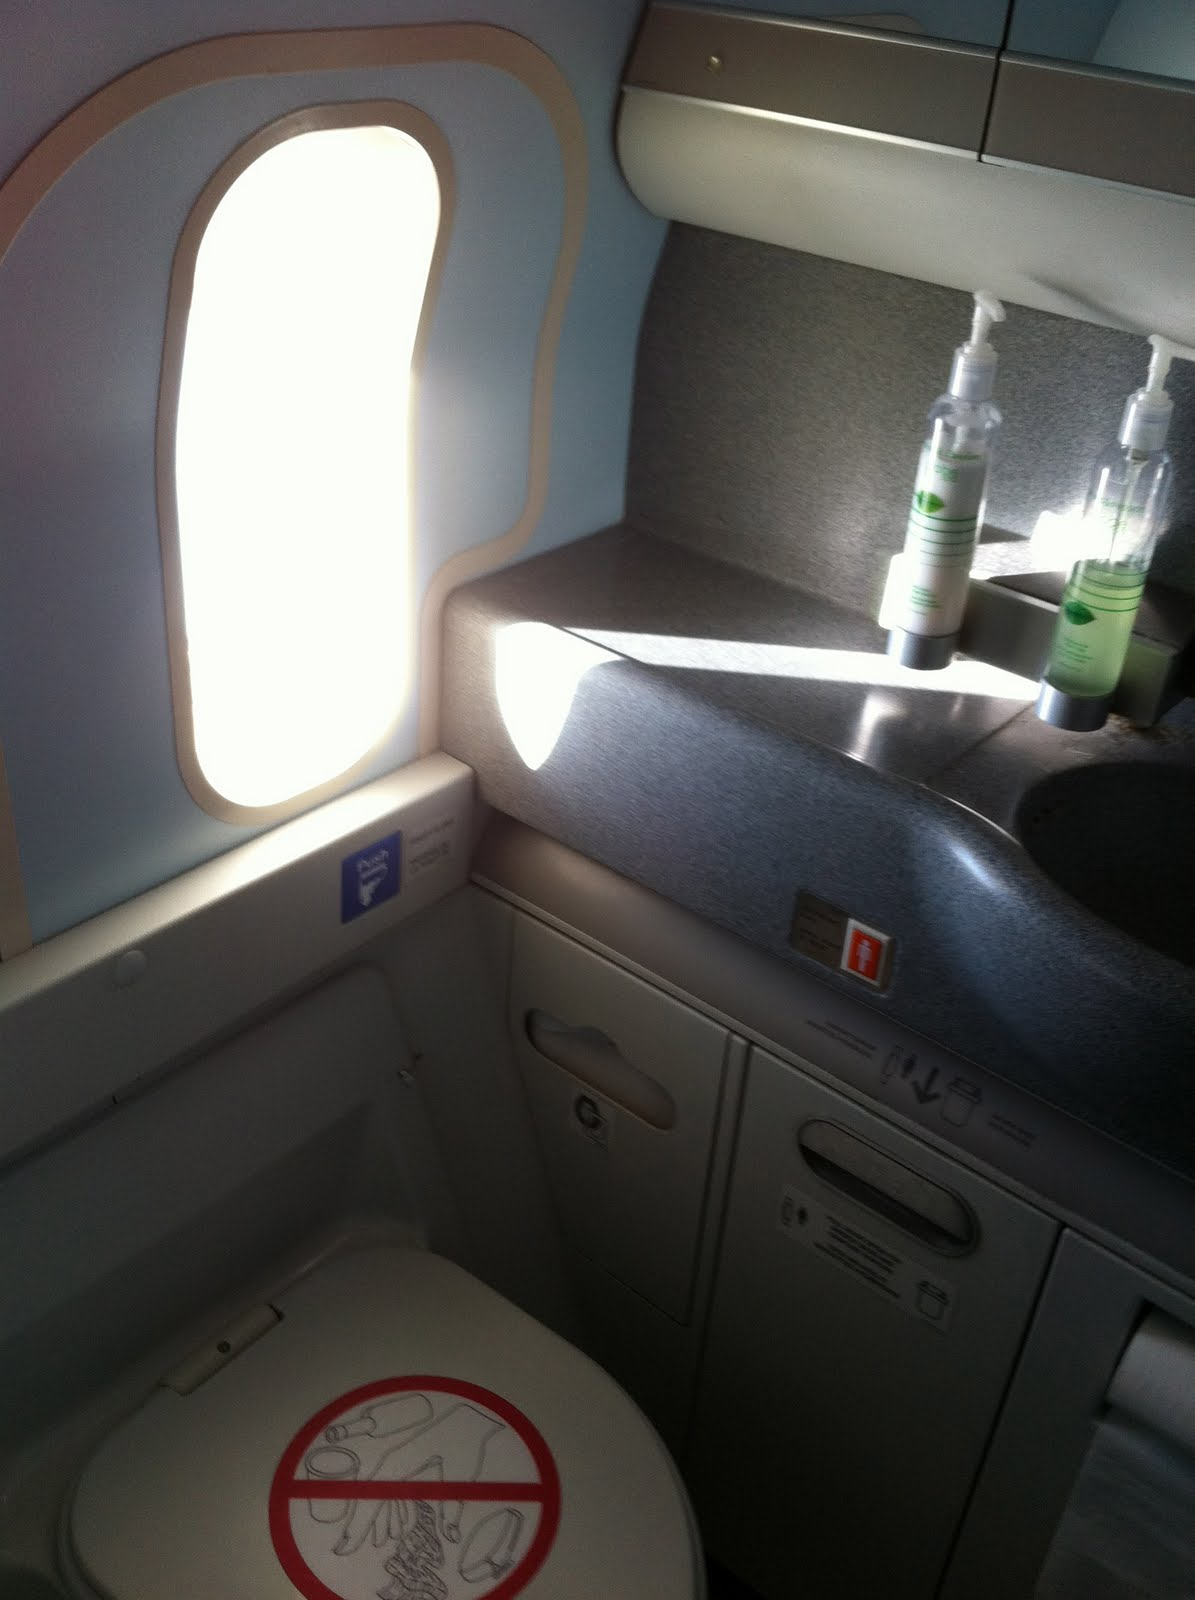 Airplane bathrooms